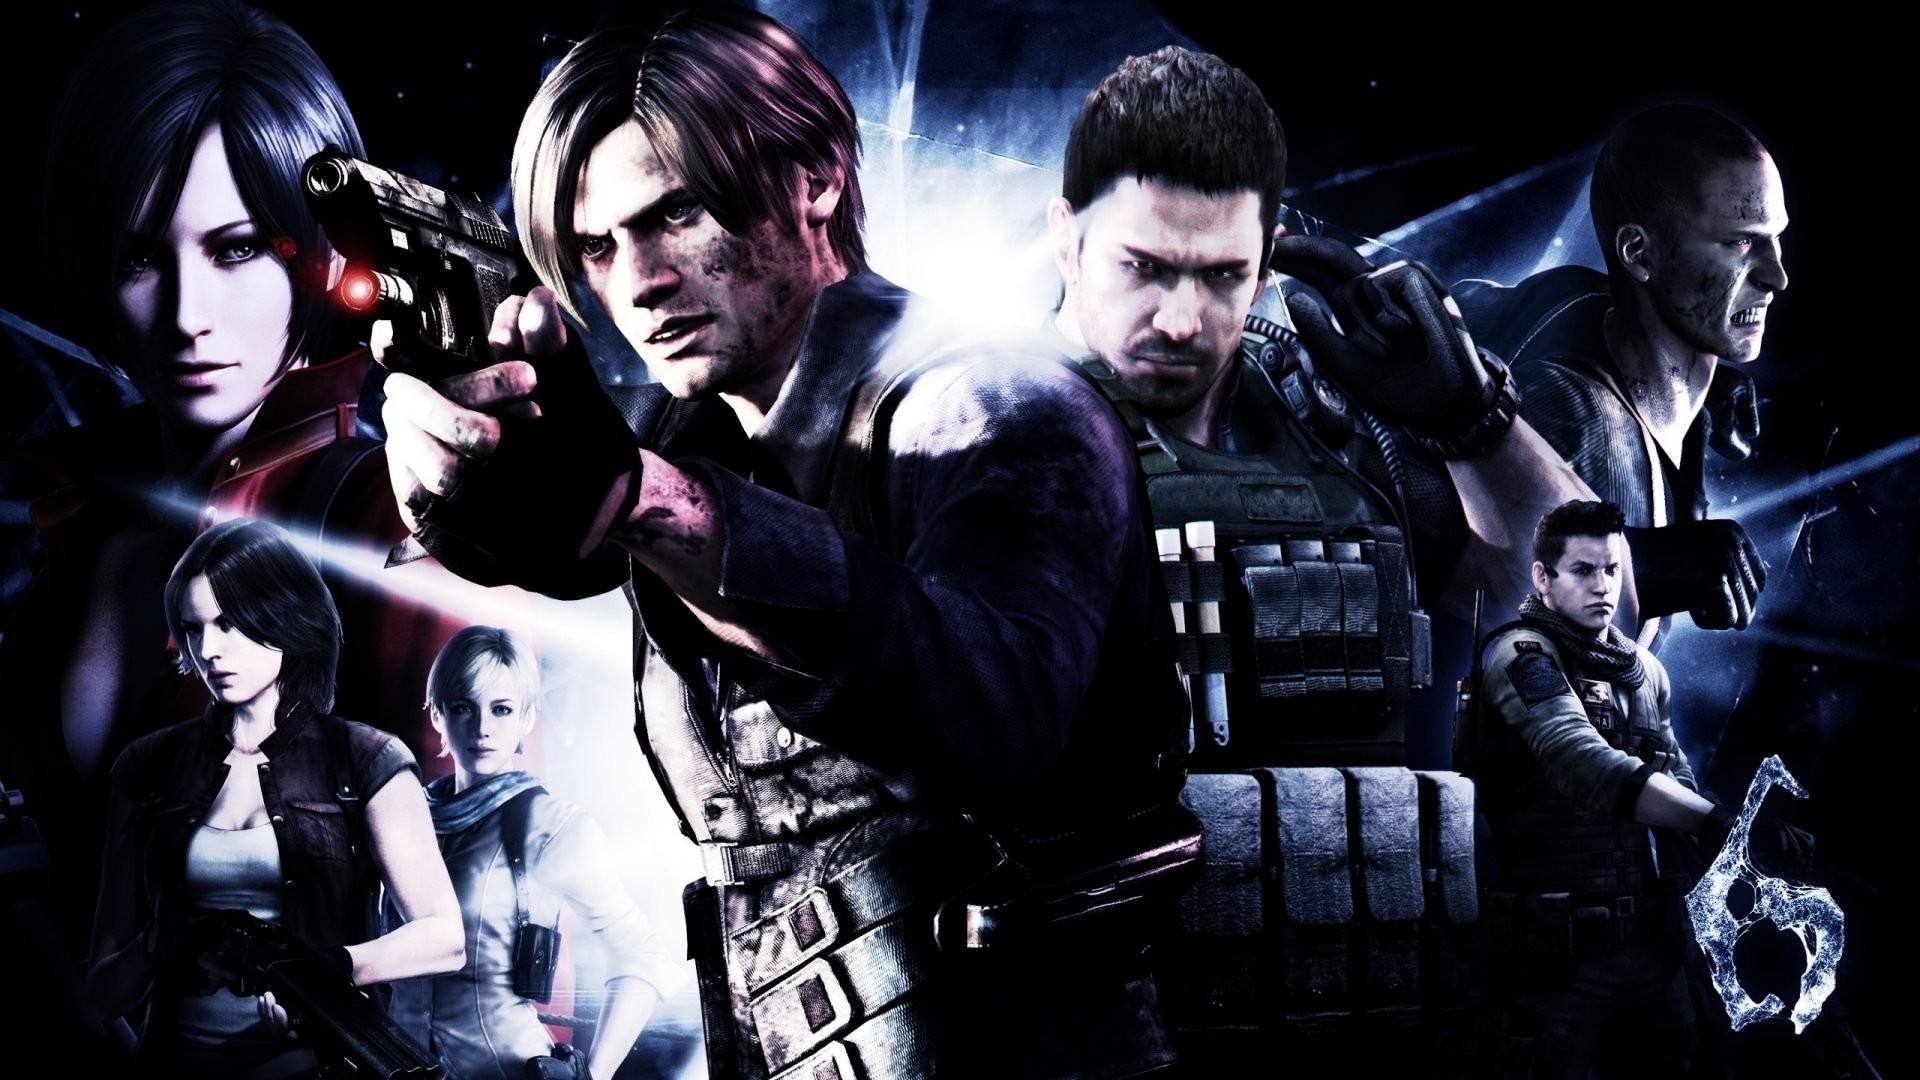 Resident Evil 6 Wallpaper HD 1920x1080 1